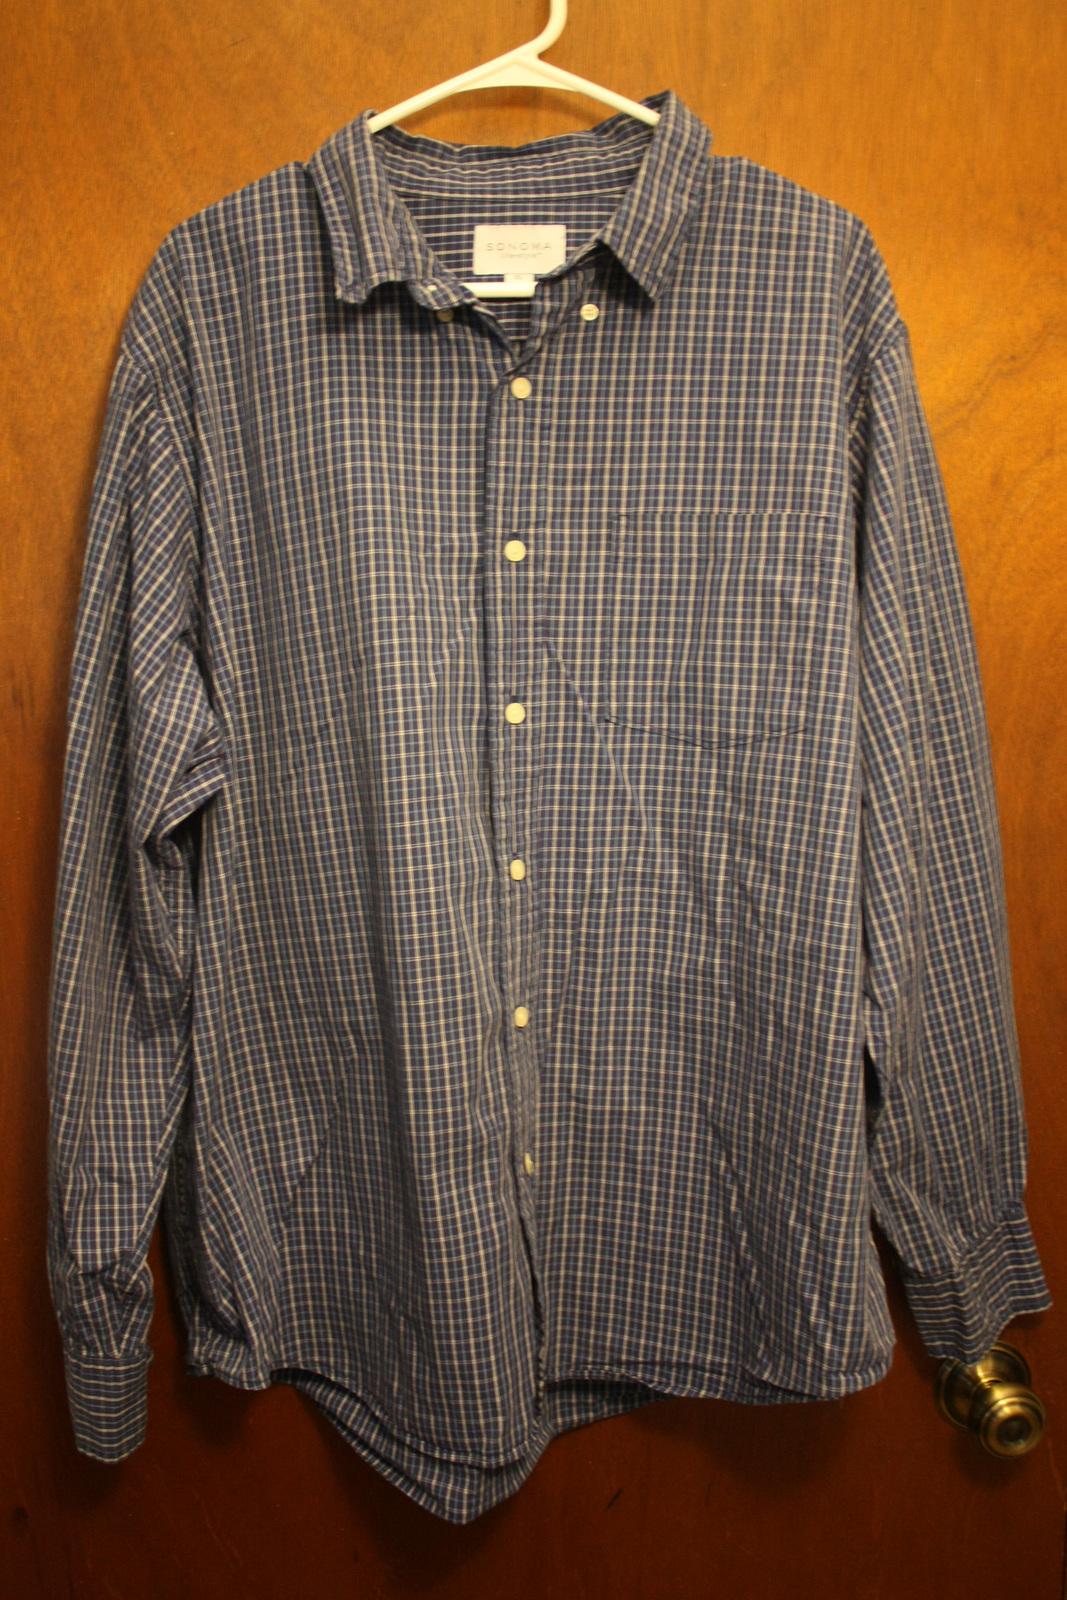 Sonoma Blue Plaid Long Sleeve Dress Shirt - Size XL - $14.99